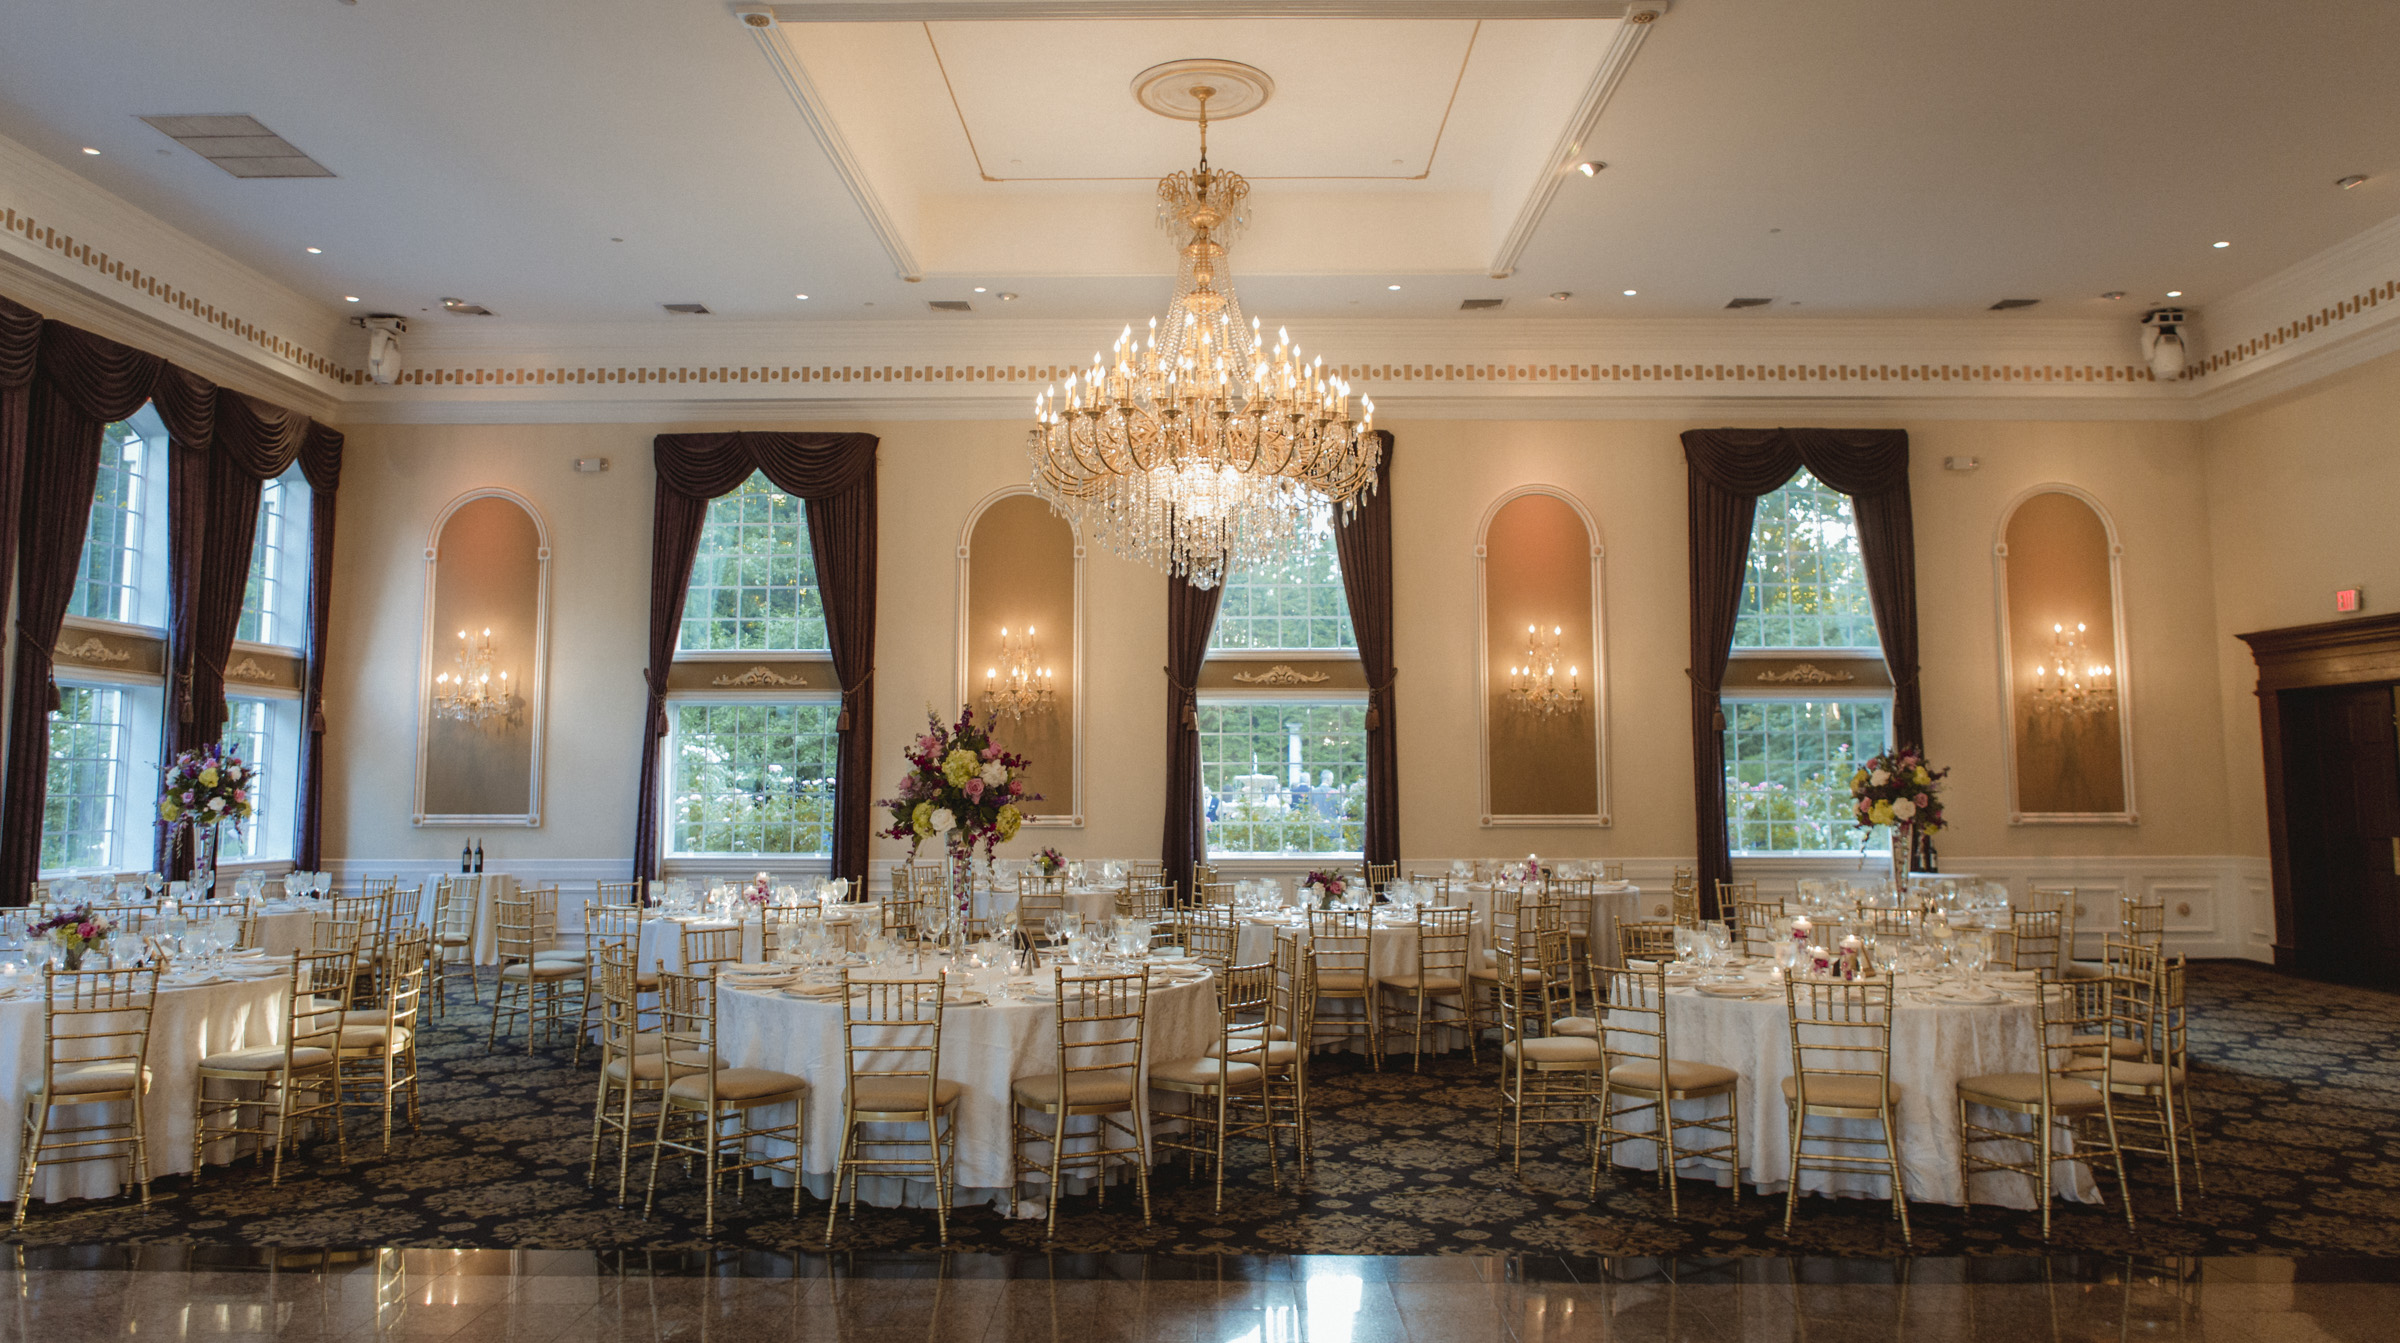 Gorgeous ballroom - Estate at Florentine Gardens wedding - Hudson Valley Wedding - Kelsey & Anish's wedding - Amy Sims Photography